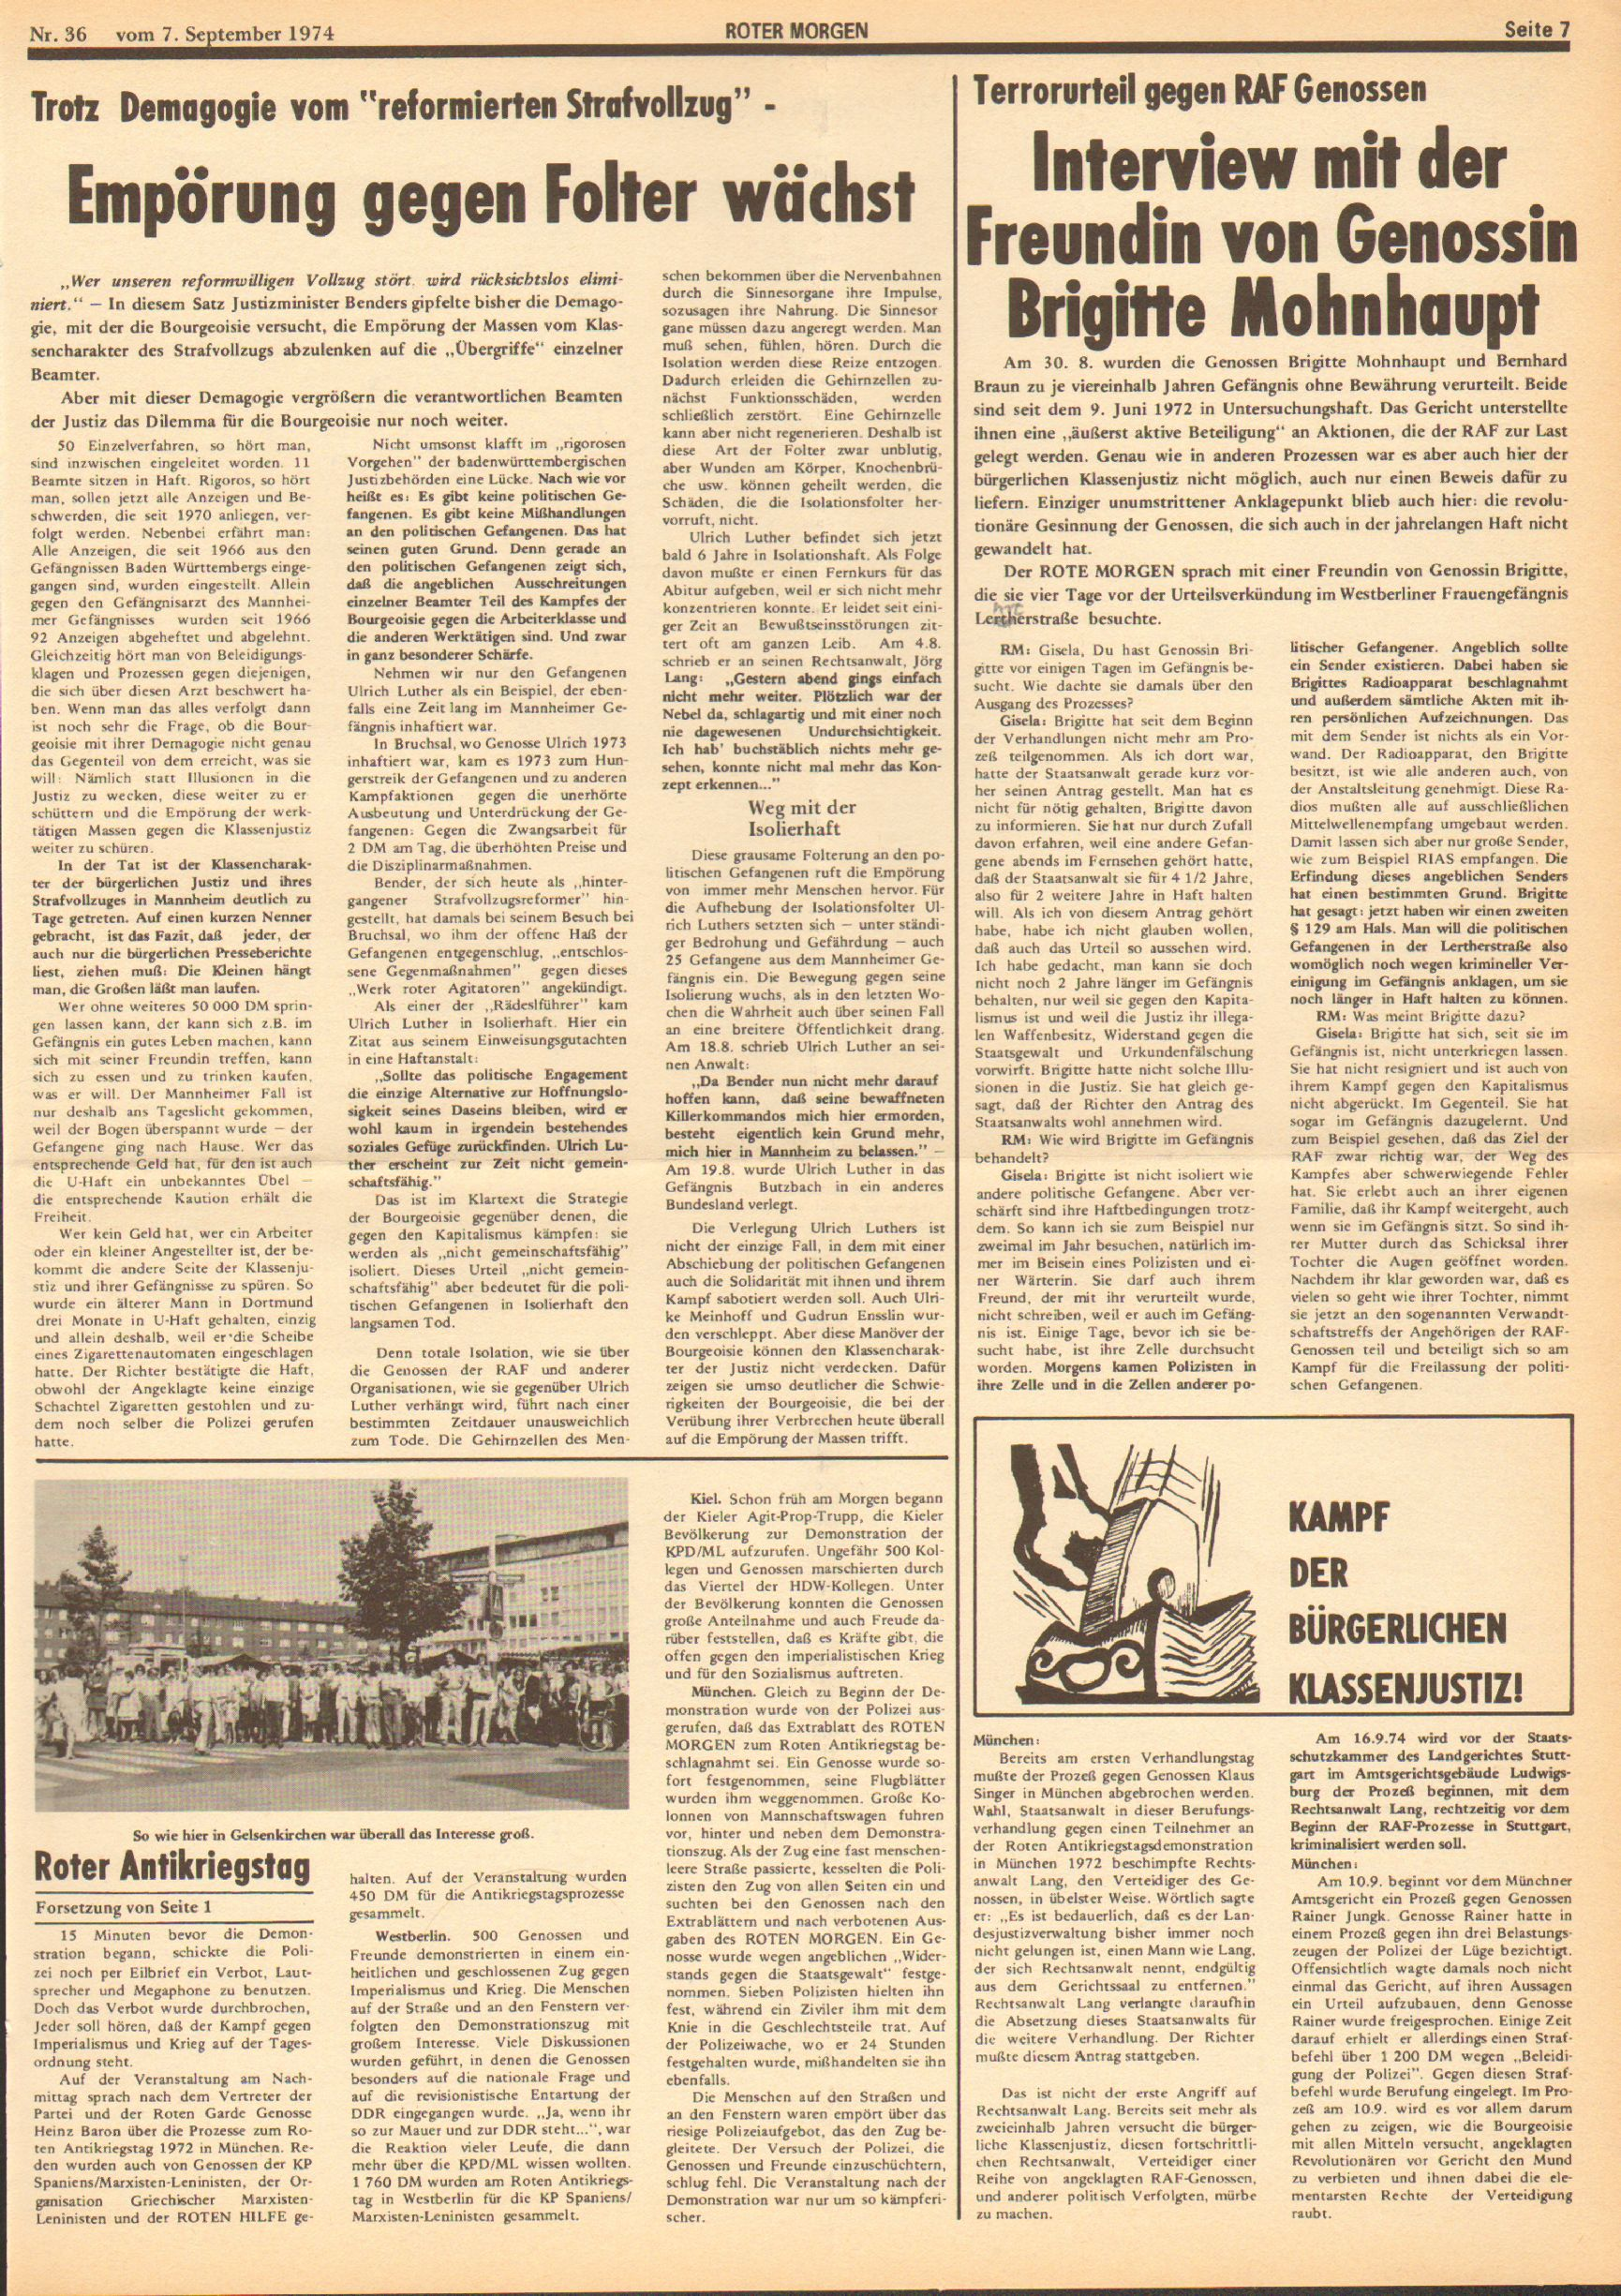 Roter Morgen, 8. Jg., 7. September 1974, Nr. 36, Seite 7